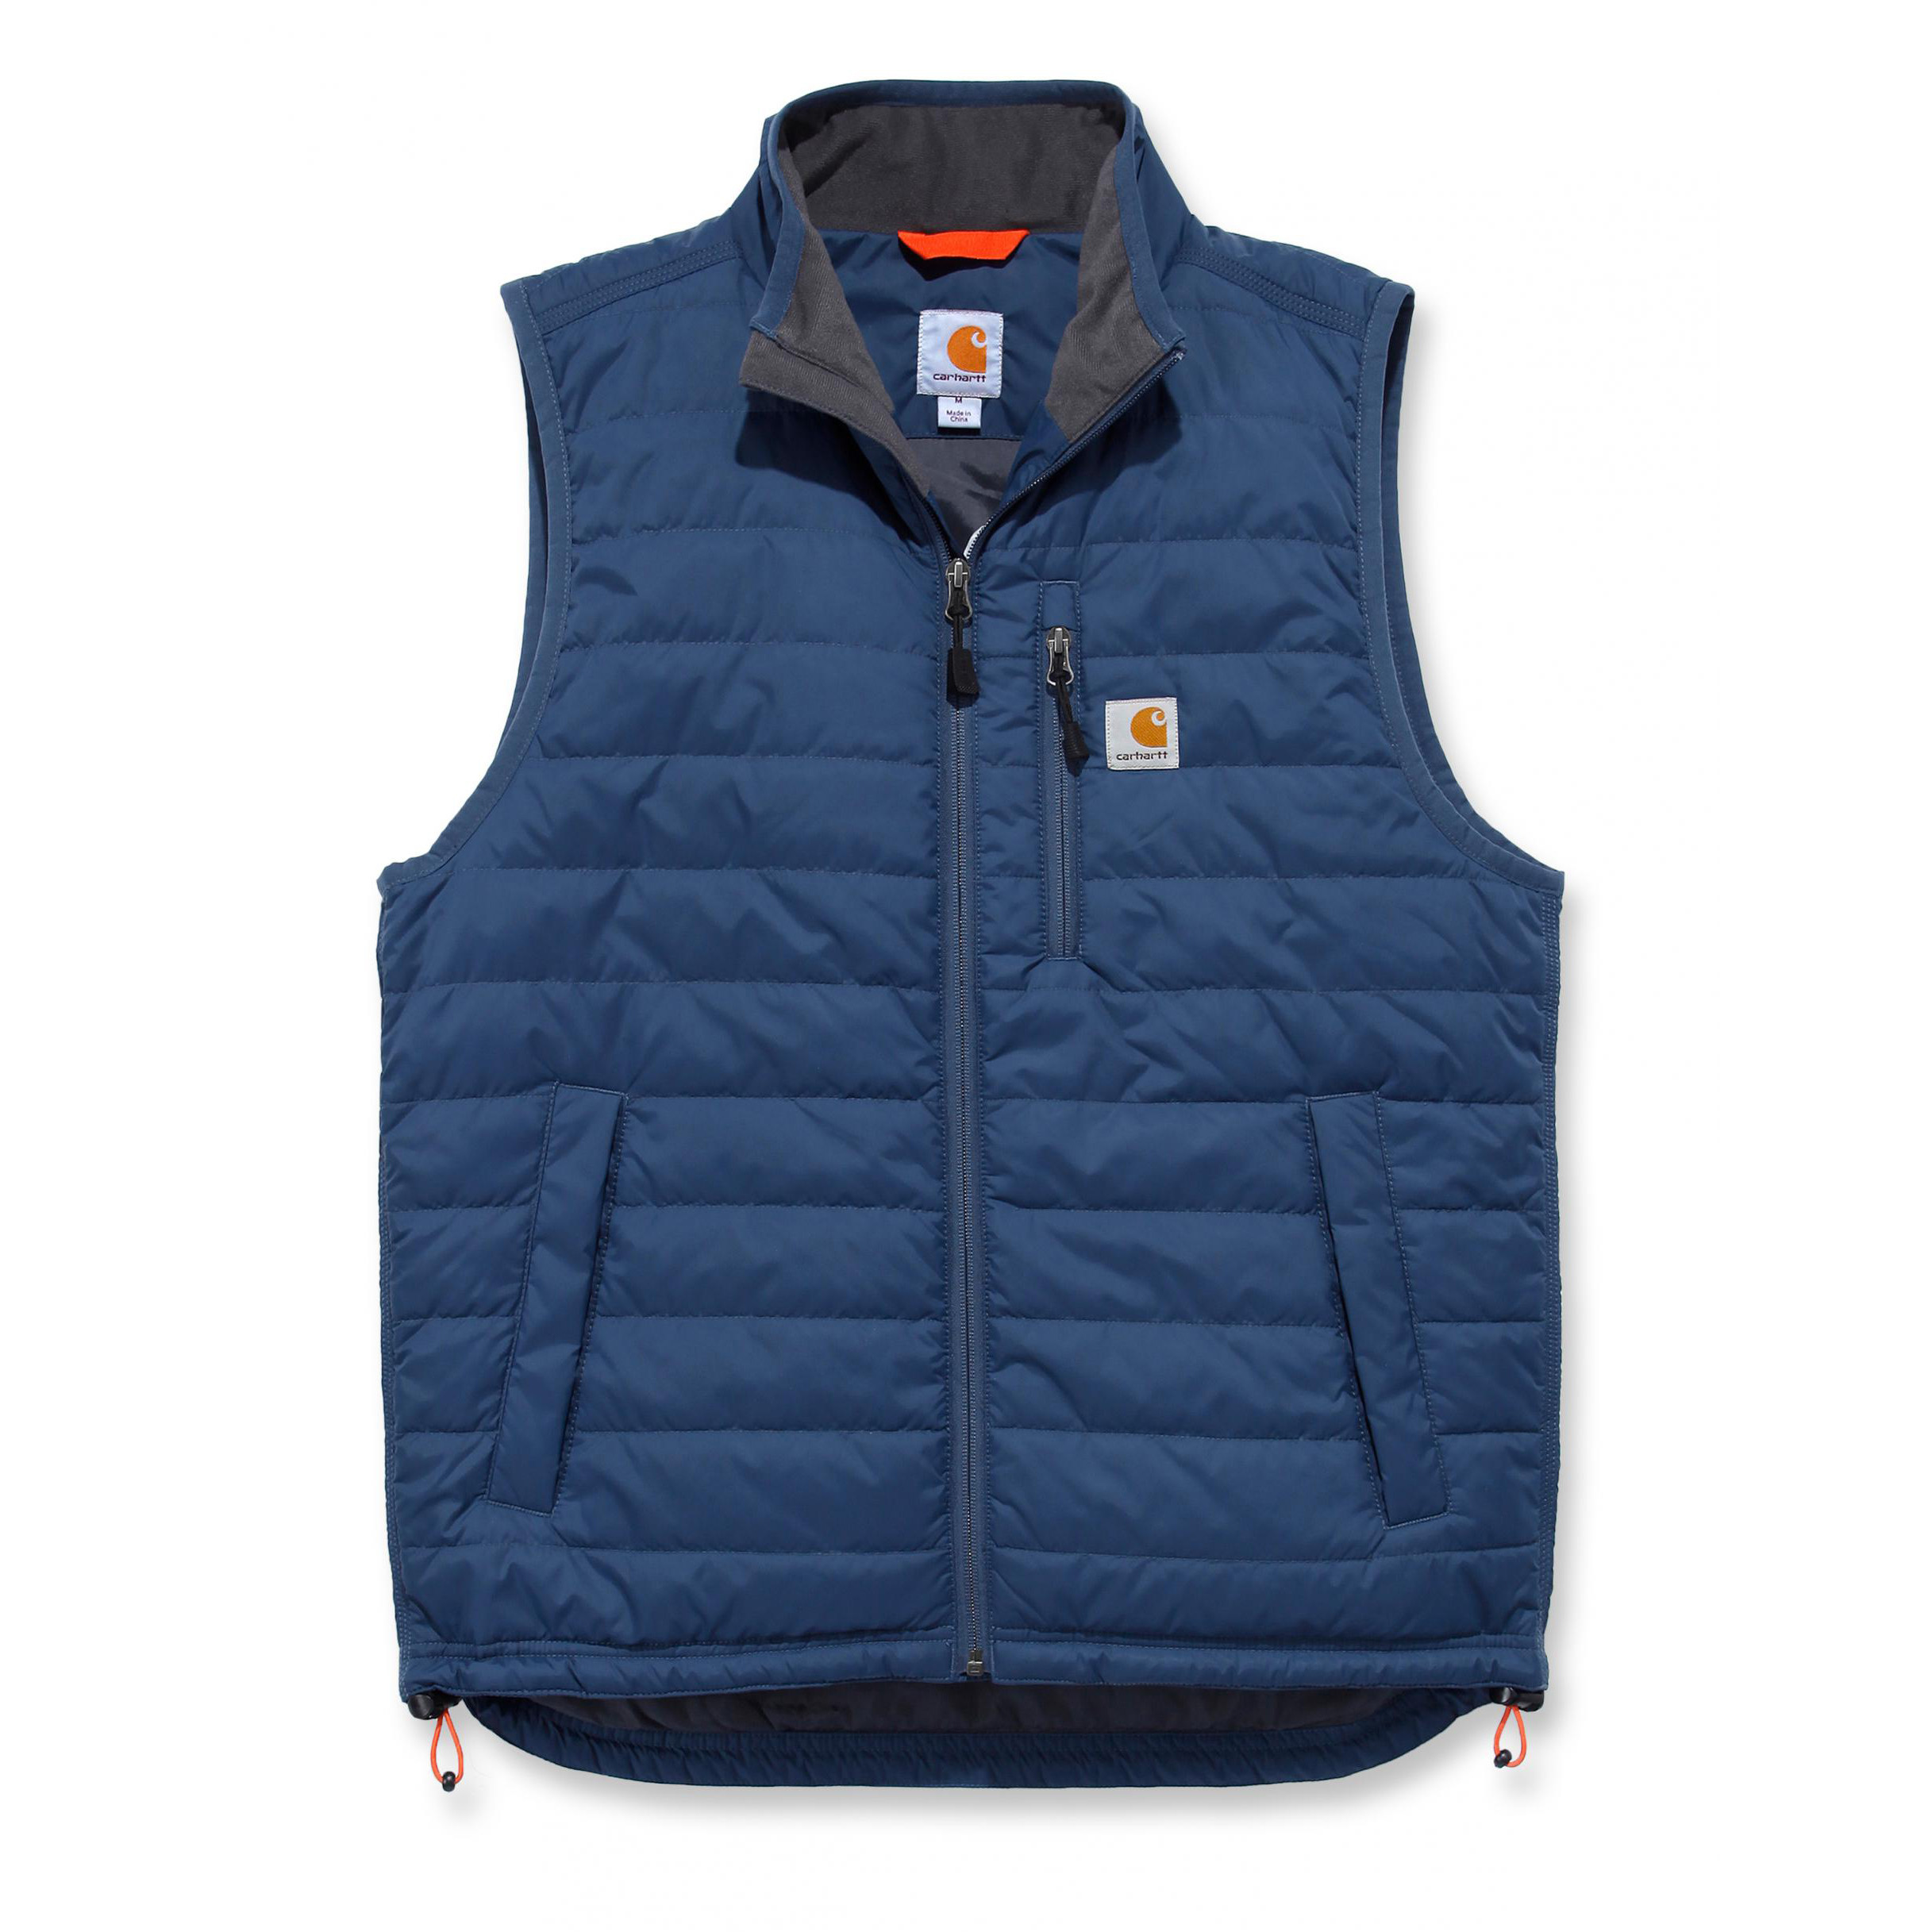 Жилет Carhartt Gilliam Vest - 102286 (Dark Blue, S)